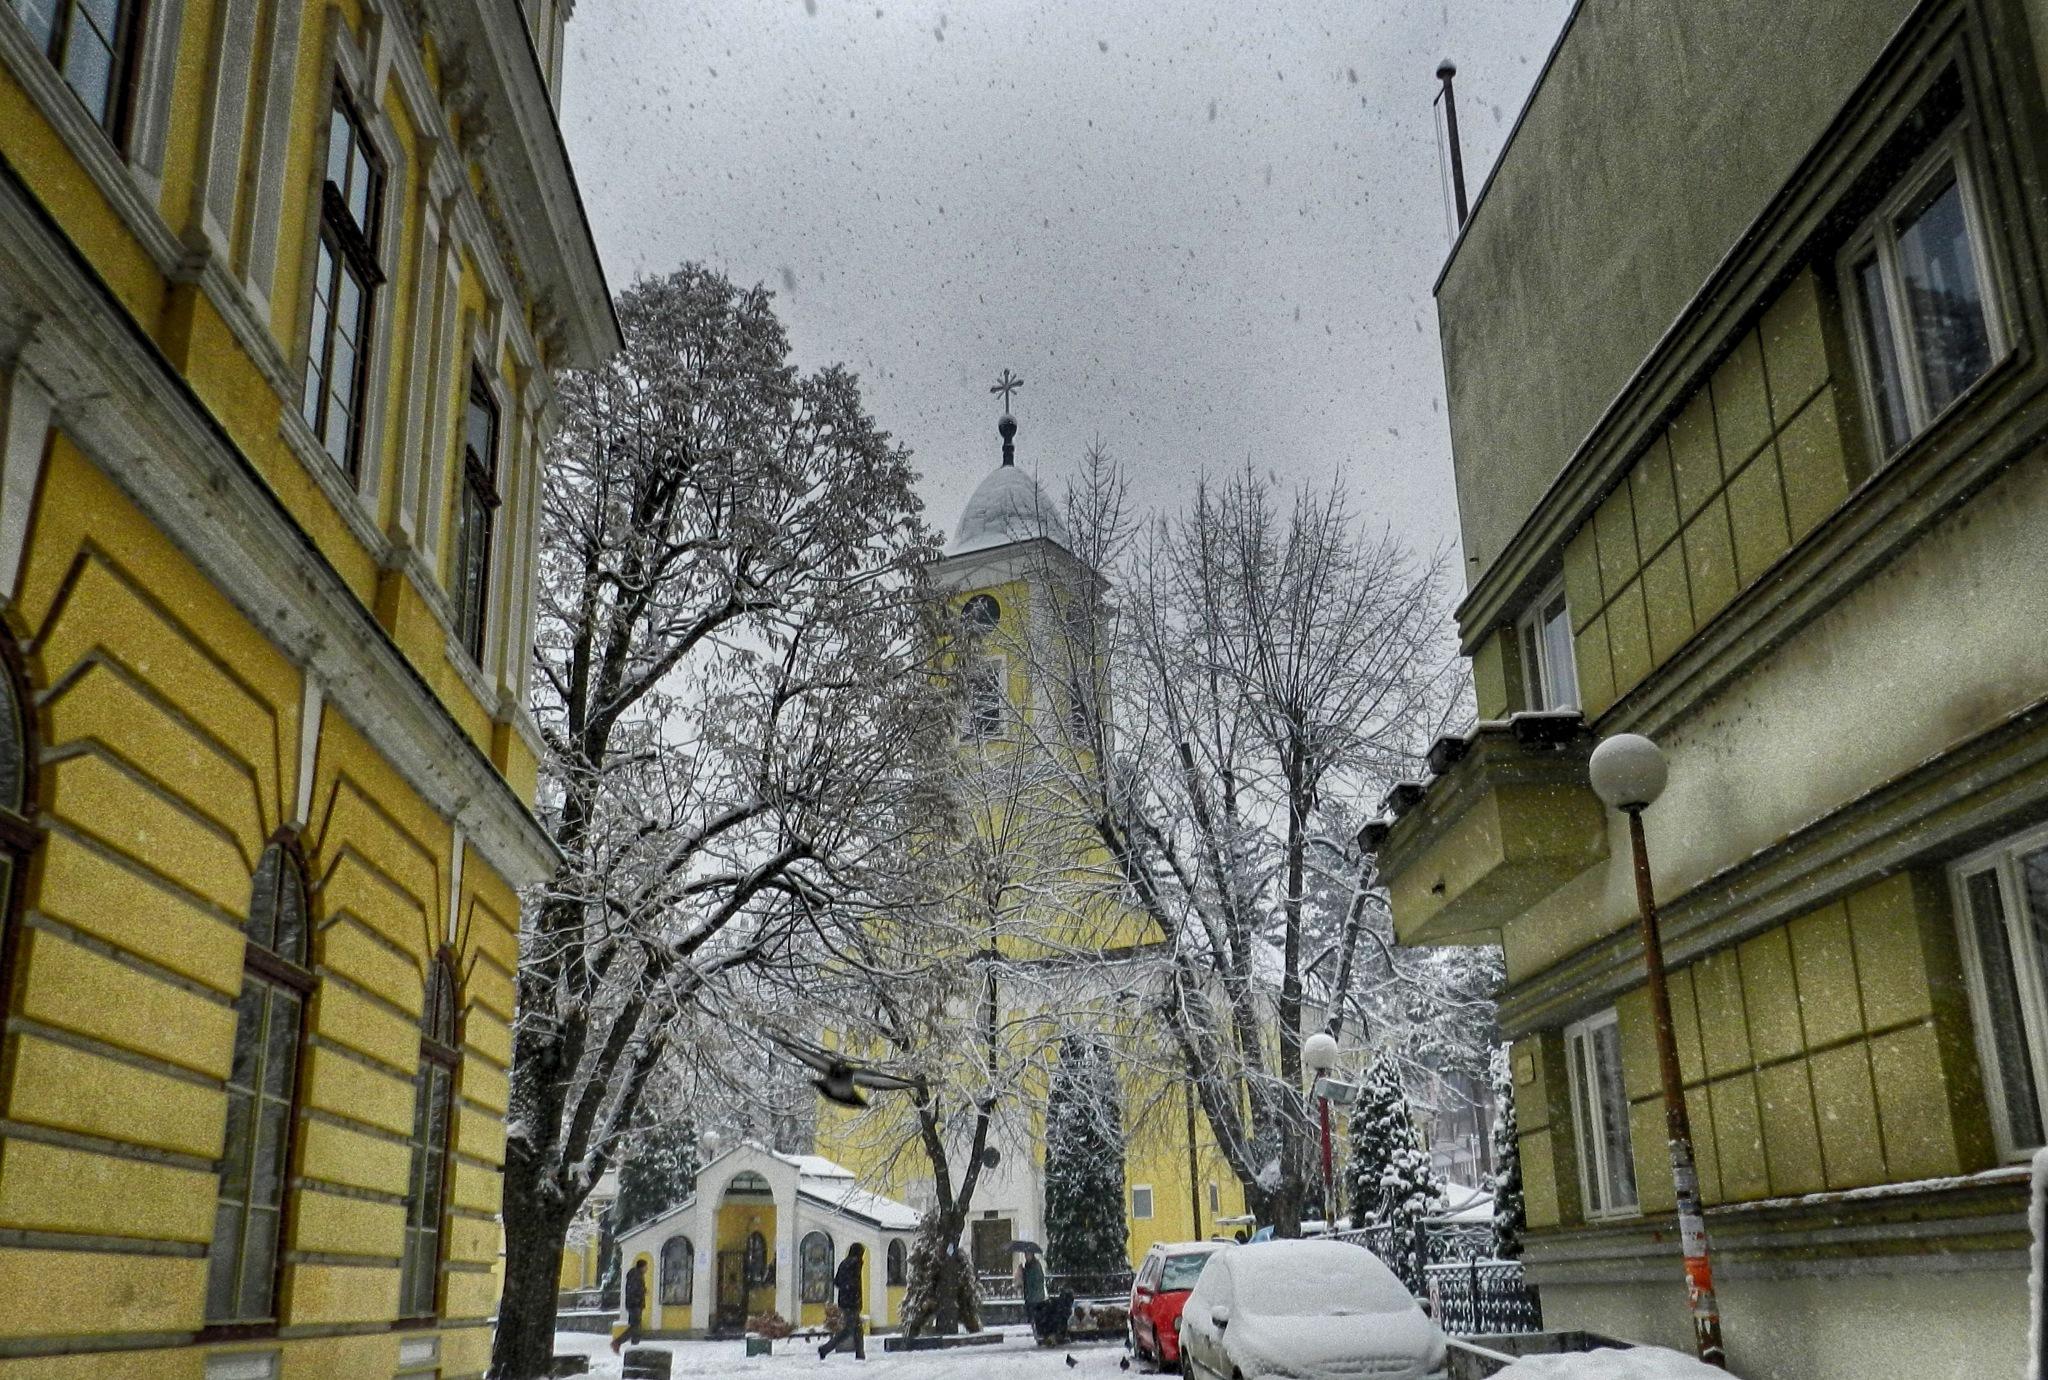 Ужице, Србија  by stevsveto